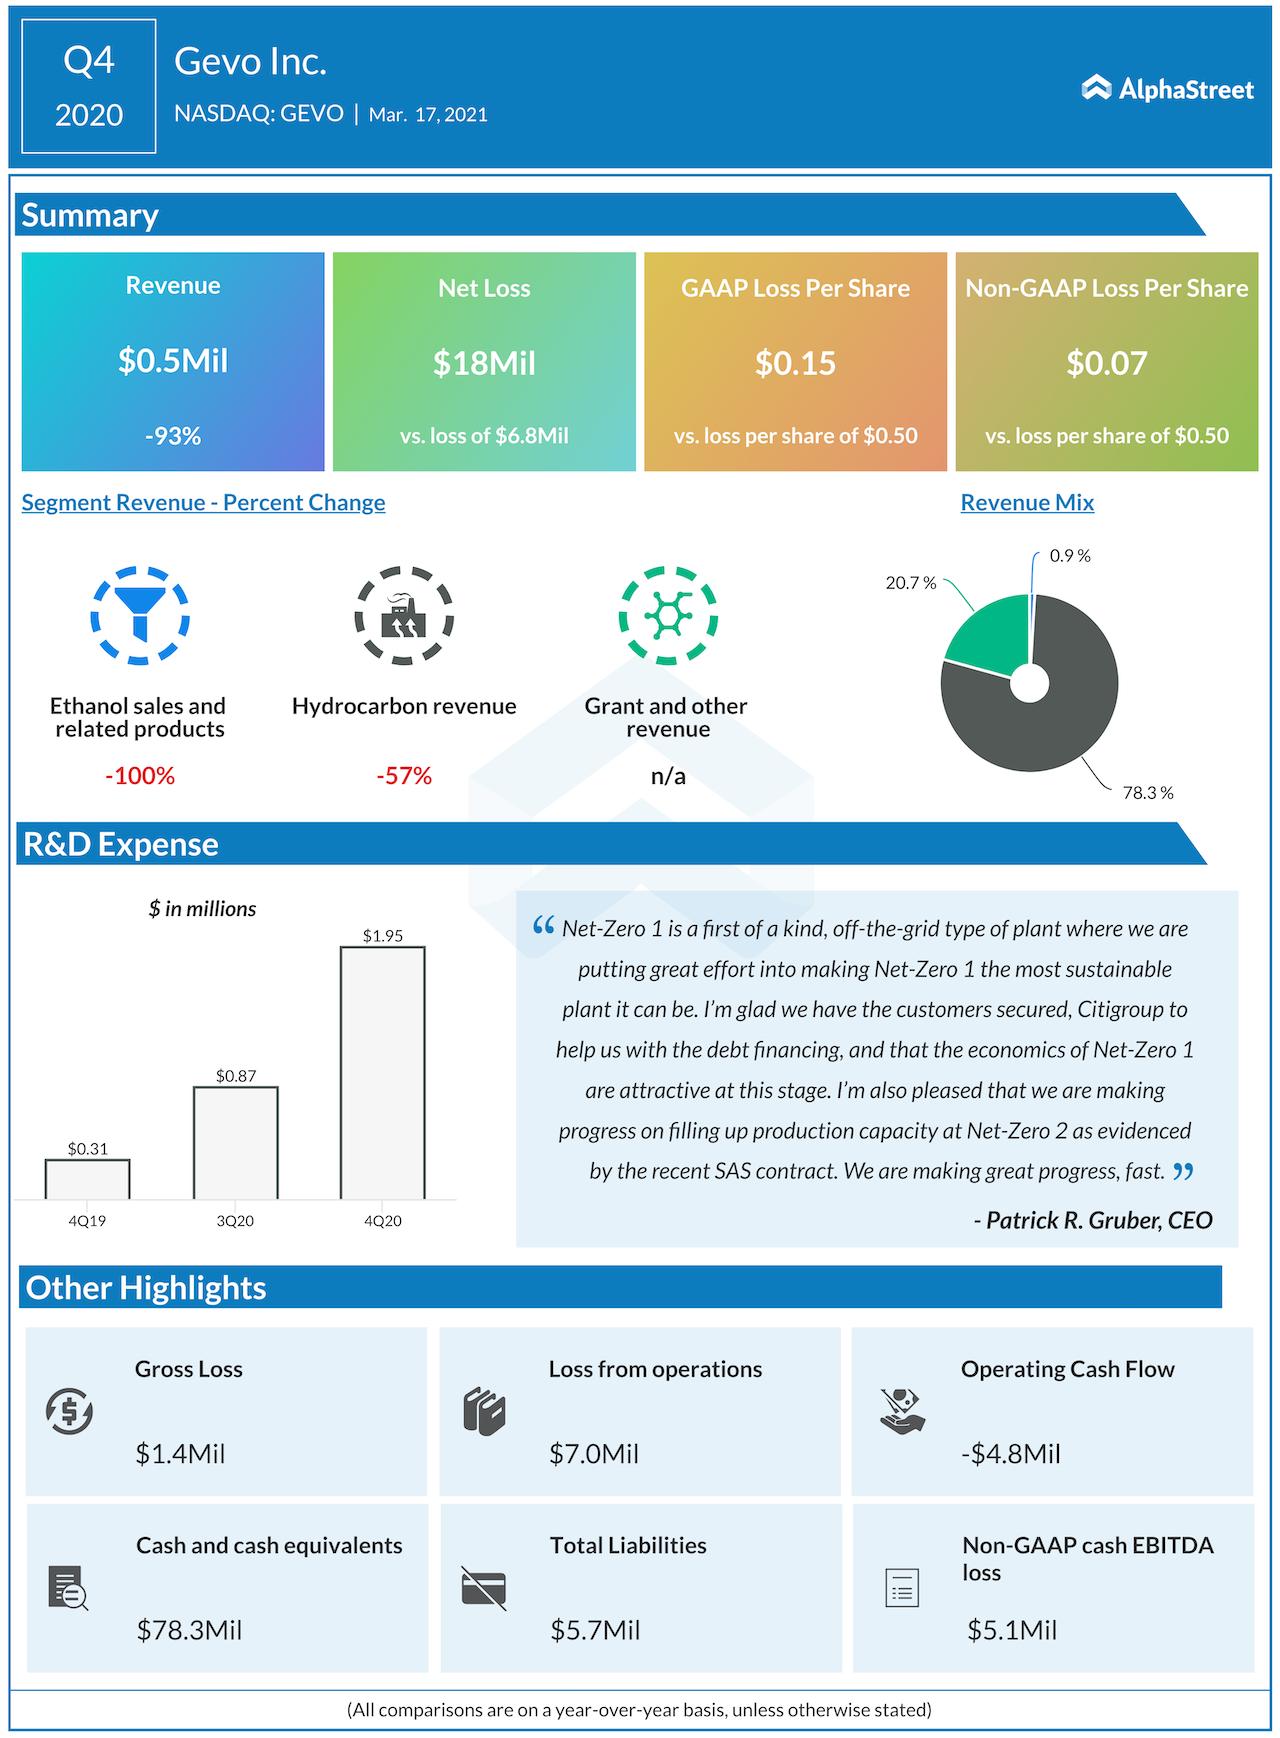 Gevo Q4 2020 earnings infographic